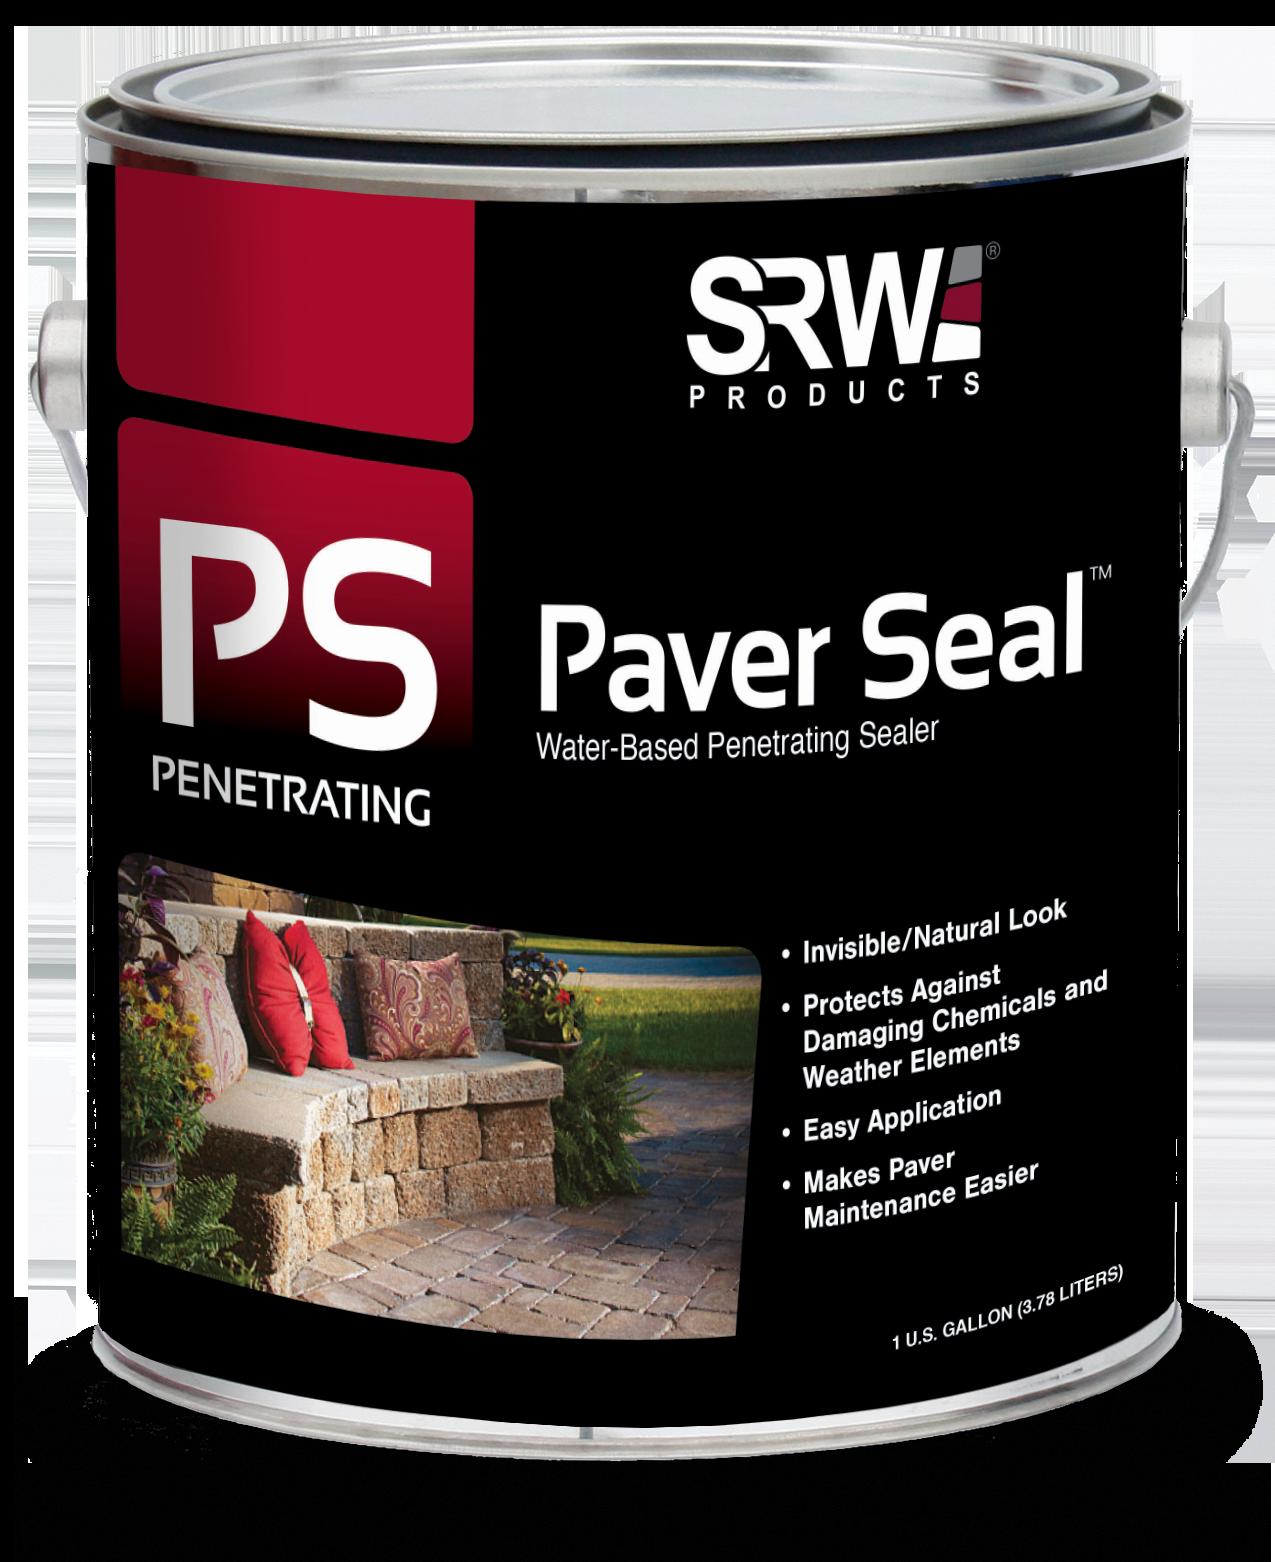 PS_1Gallon_Paver Seal_2019_RGB_SHADOW